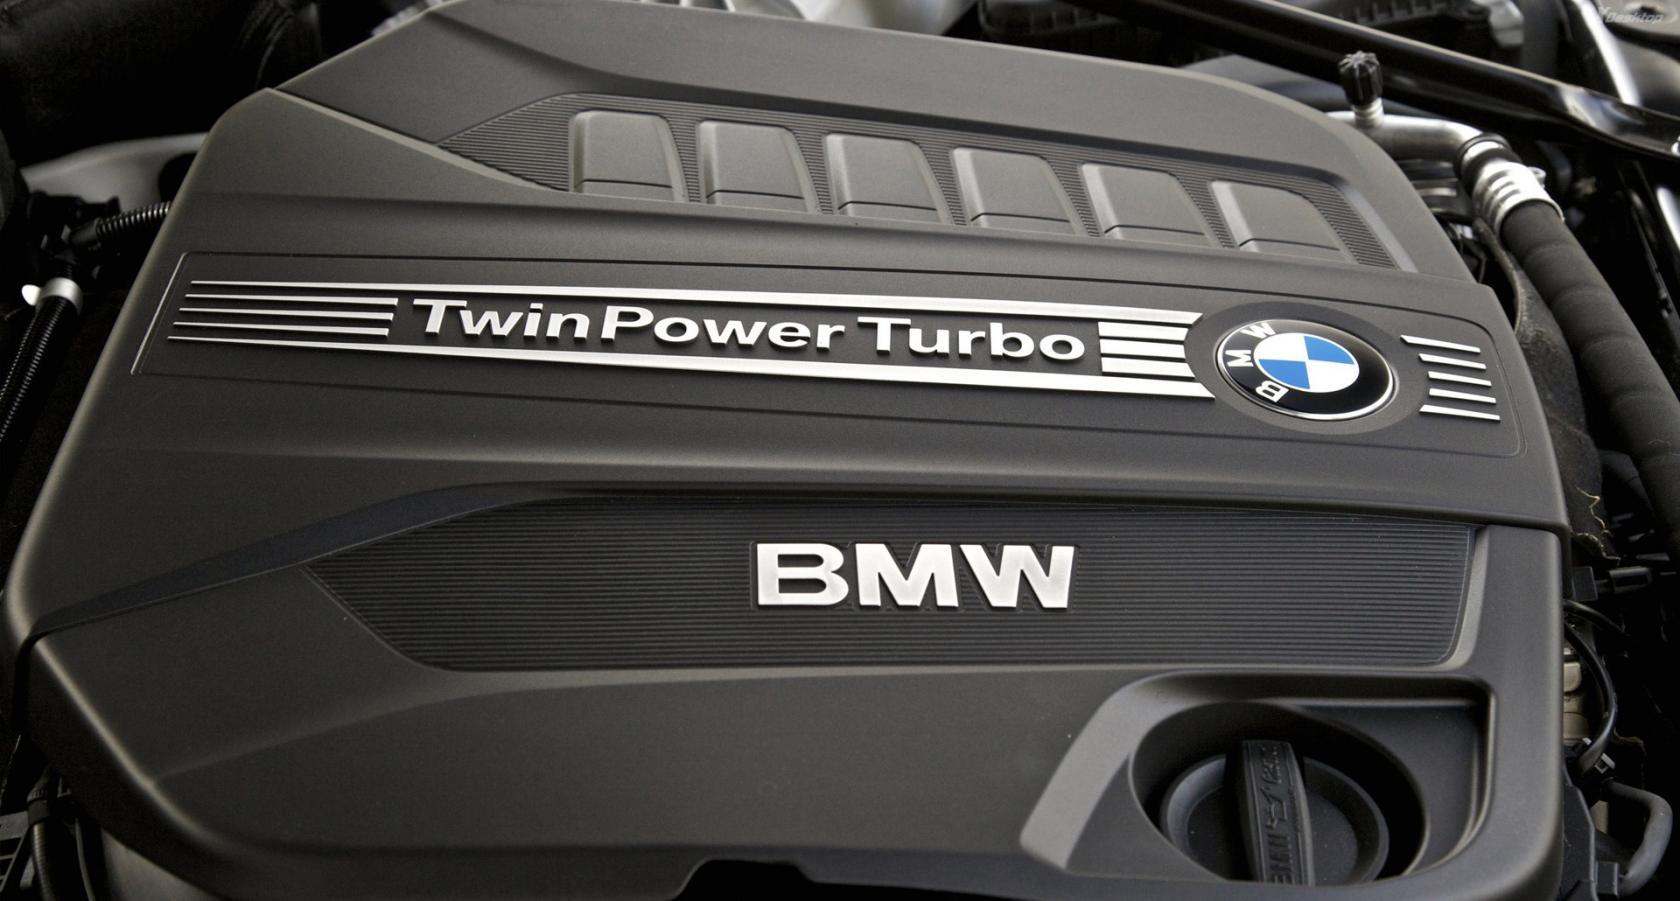 Moteurs-BMW-six-cylindres-en-ligne-10.jpeg